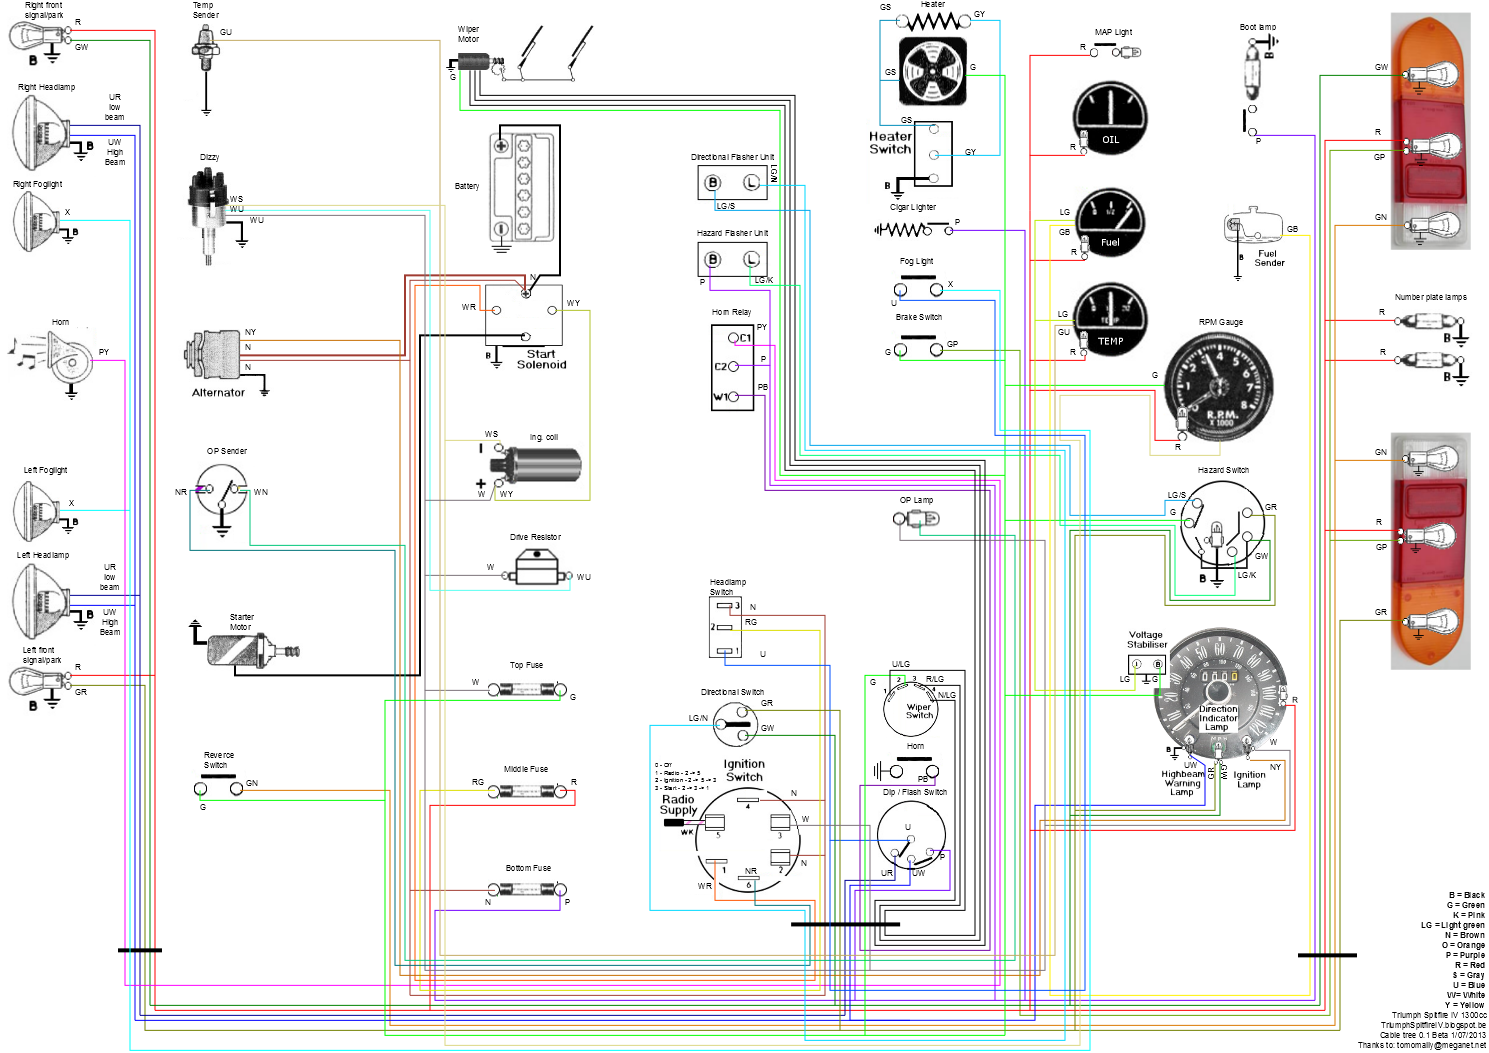 hight resolution of 1970 tr6 wiring diagrams wiring diagram triumph tr6 transmission triumph tr6 fog lamp wiring diagram